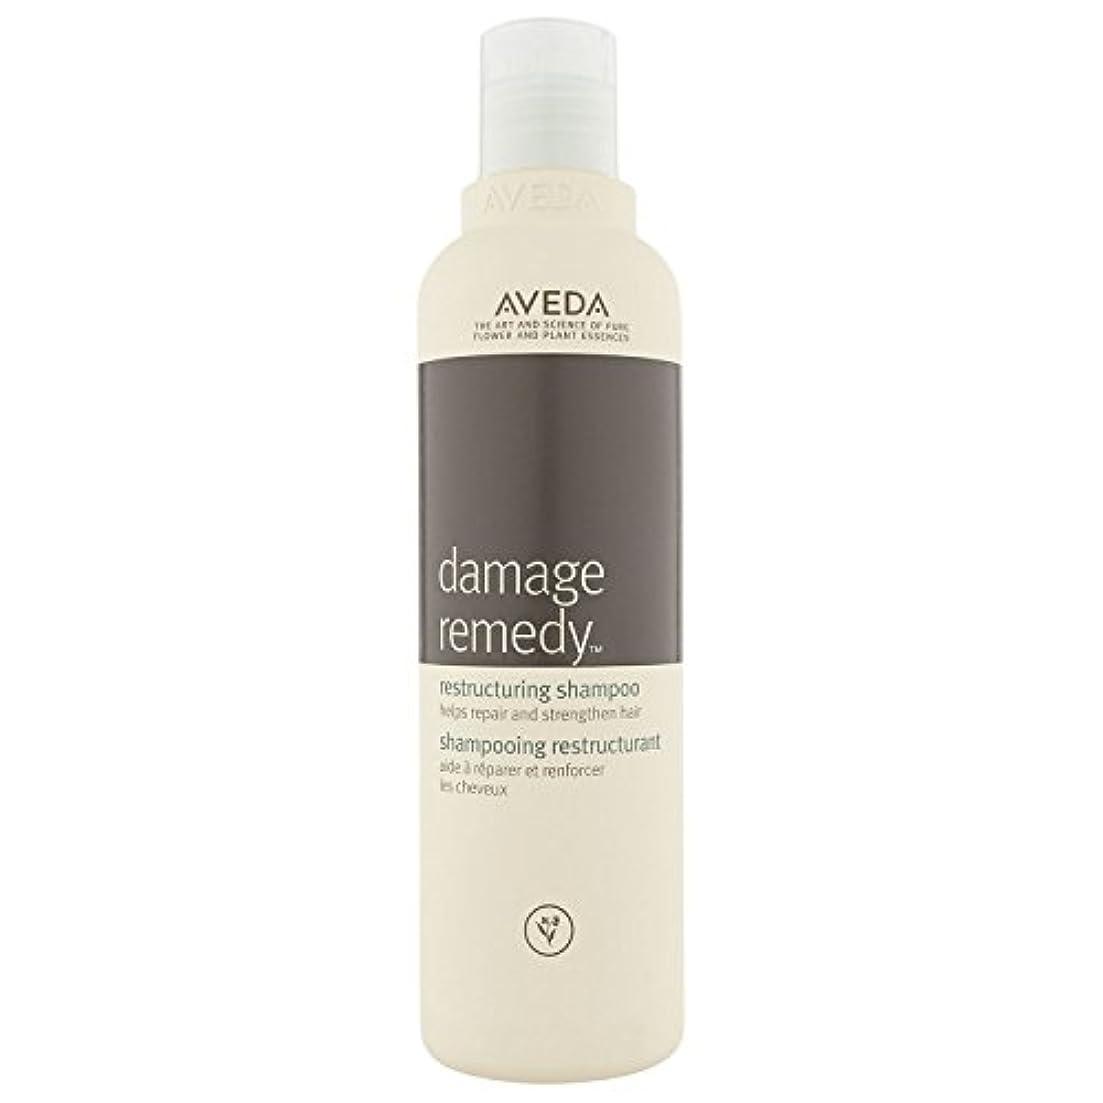 [AVEDA] アヴェダダメージ救済再編シャンプー250ミリリットル - Aveda Damage Remedy Restructuring Shampoo 250 ml [並行輸入品]